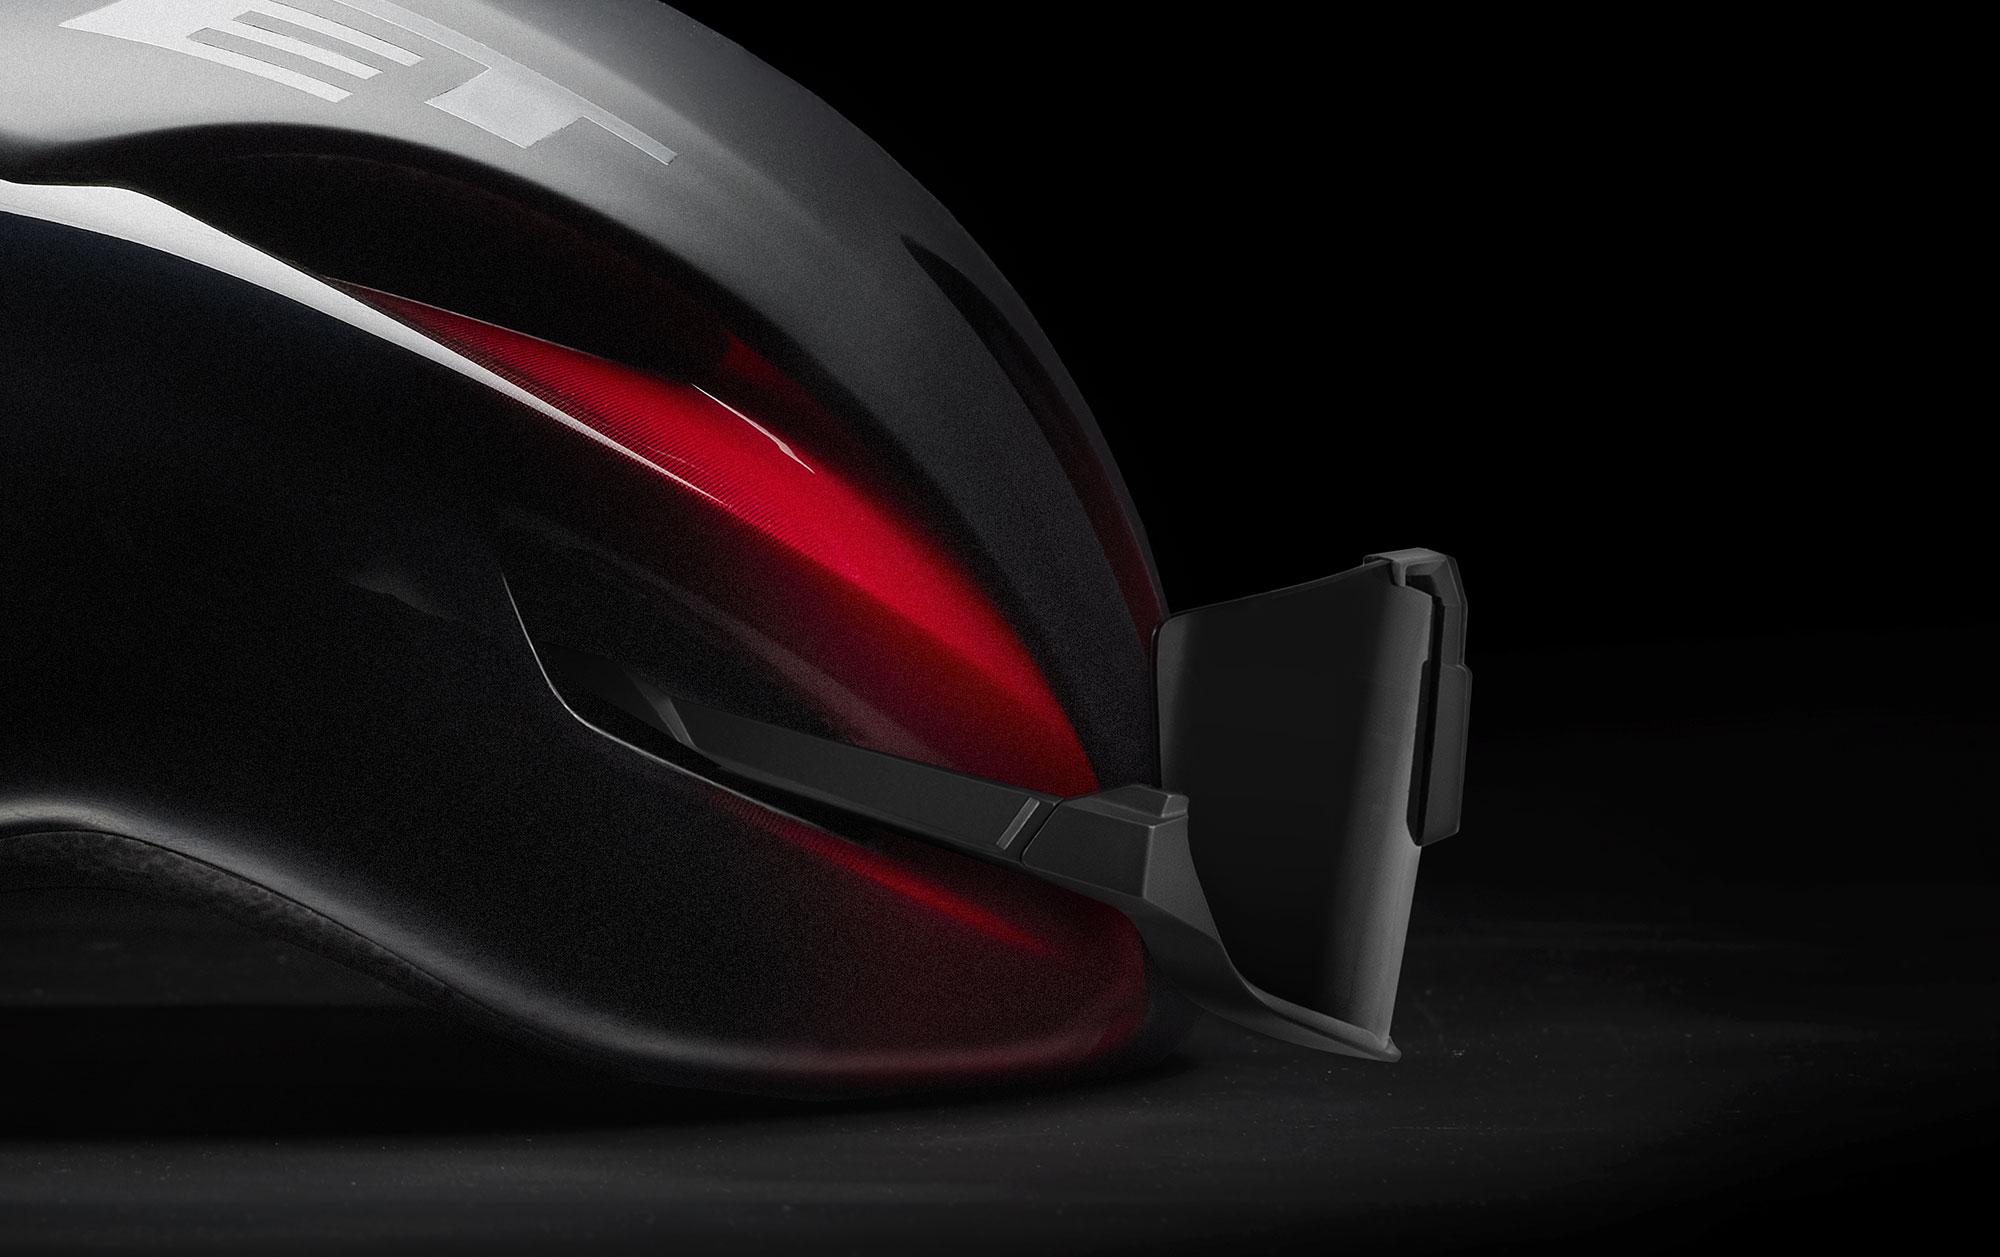 MET Manta Mips Road, Triathlon and Winter Rides Helmet: Sunglasses Ports